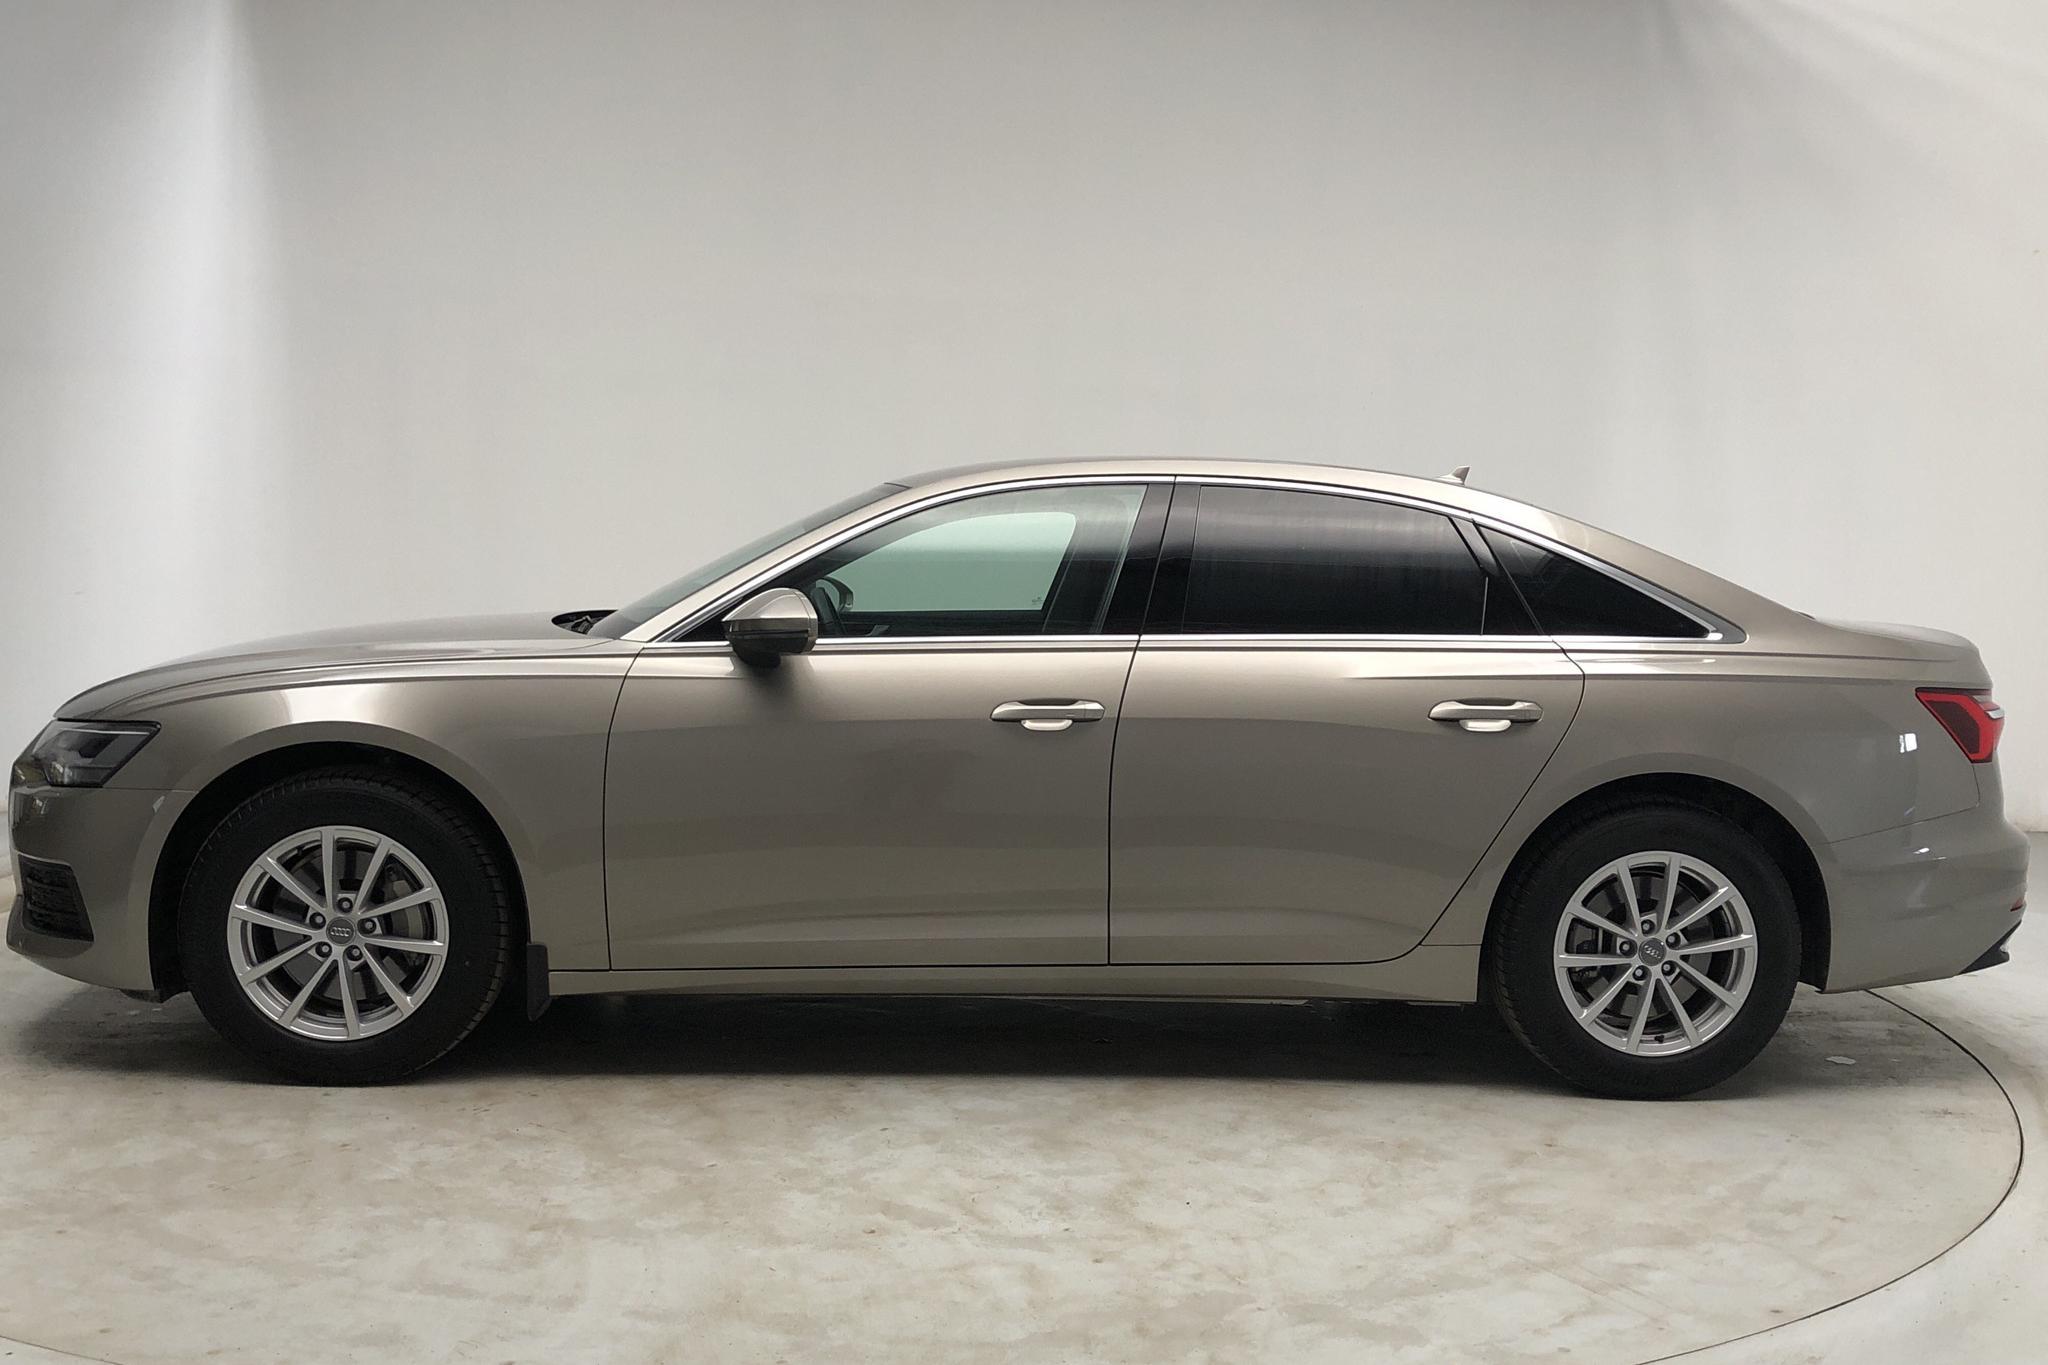 Audi A6 Sedan 45 TFSI quattro (245hk) - 12 450 km - Automatic - Light Brown - 2020